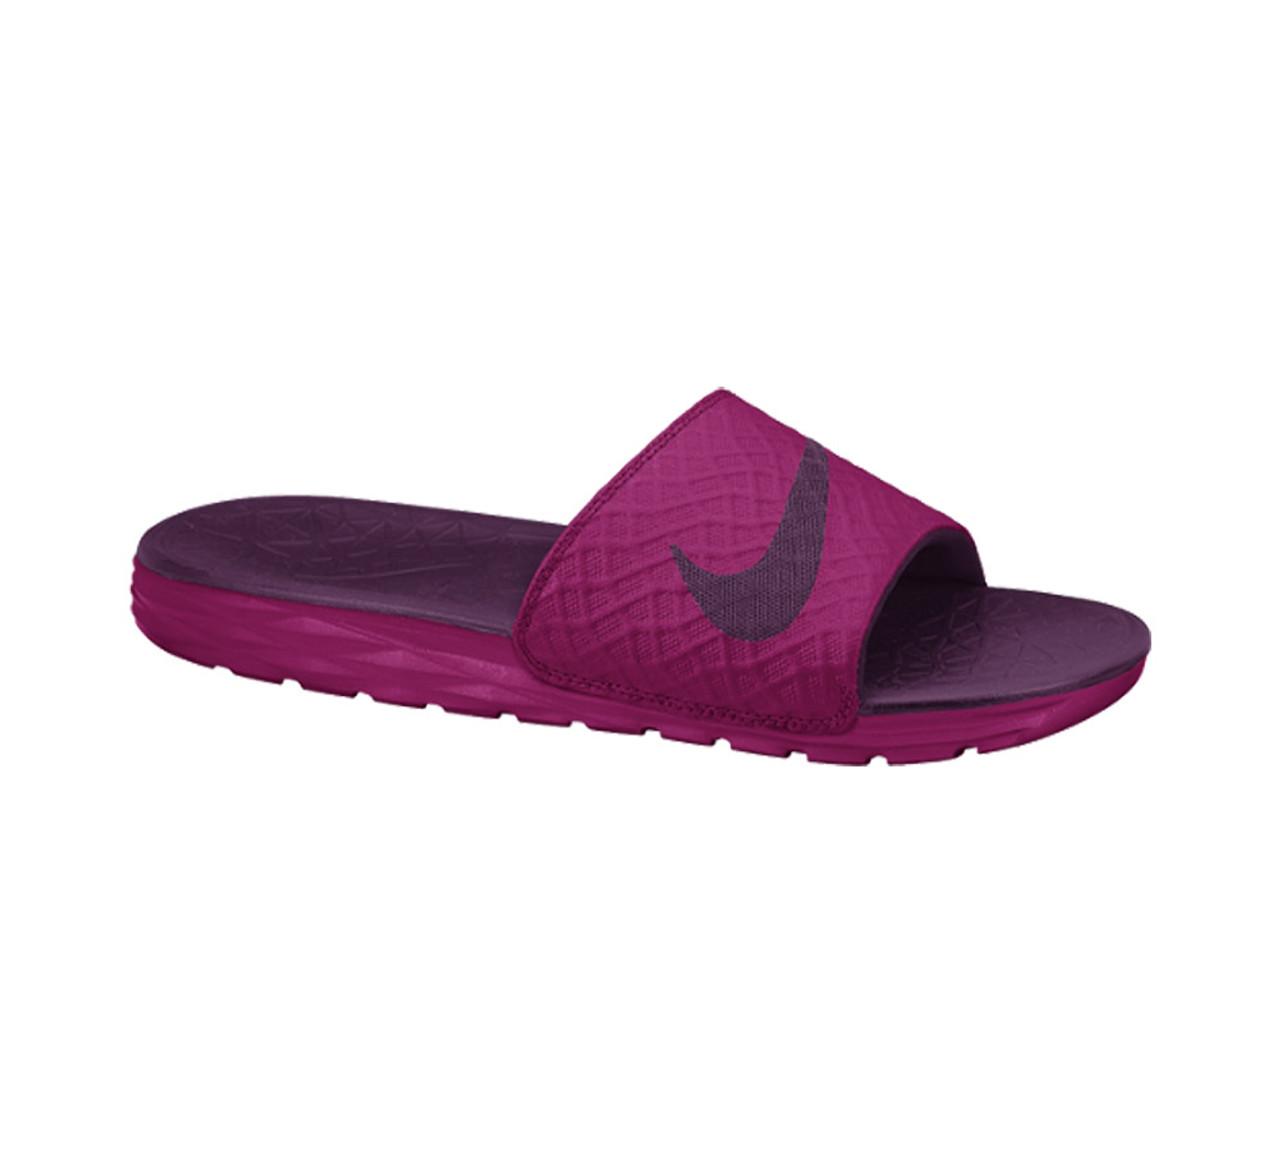 88afea5d9 Nike Women s Benassi Solarsoft Slide 2 Fuchsia Mulberry - Shop now    Shoolu.com